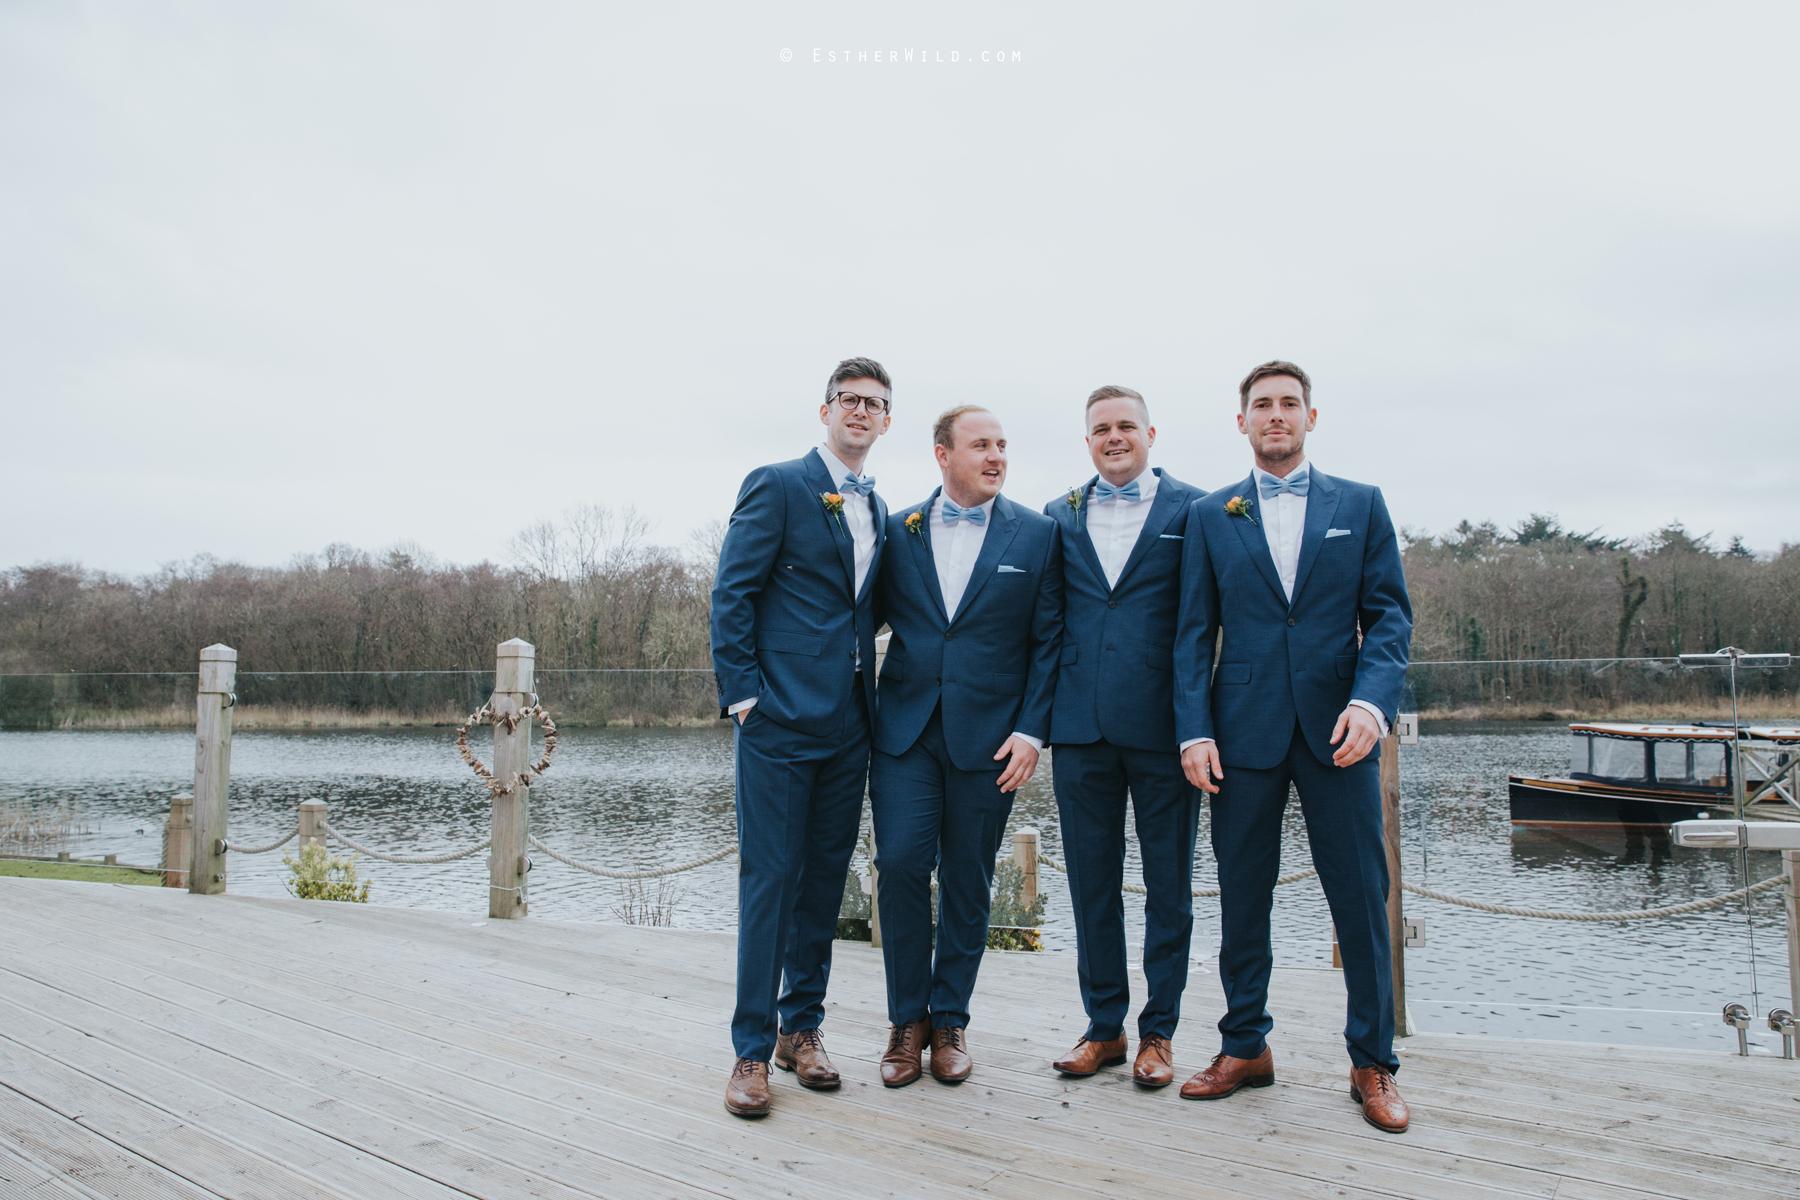 The_BoatHouse_Wedding_Venue_Ormesby_Norfolk_Broads_Boat_Wedding_Photography_Esther_Wild_Photographer_IMG_1965.jpg